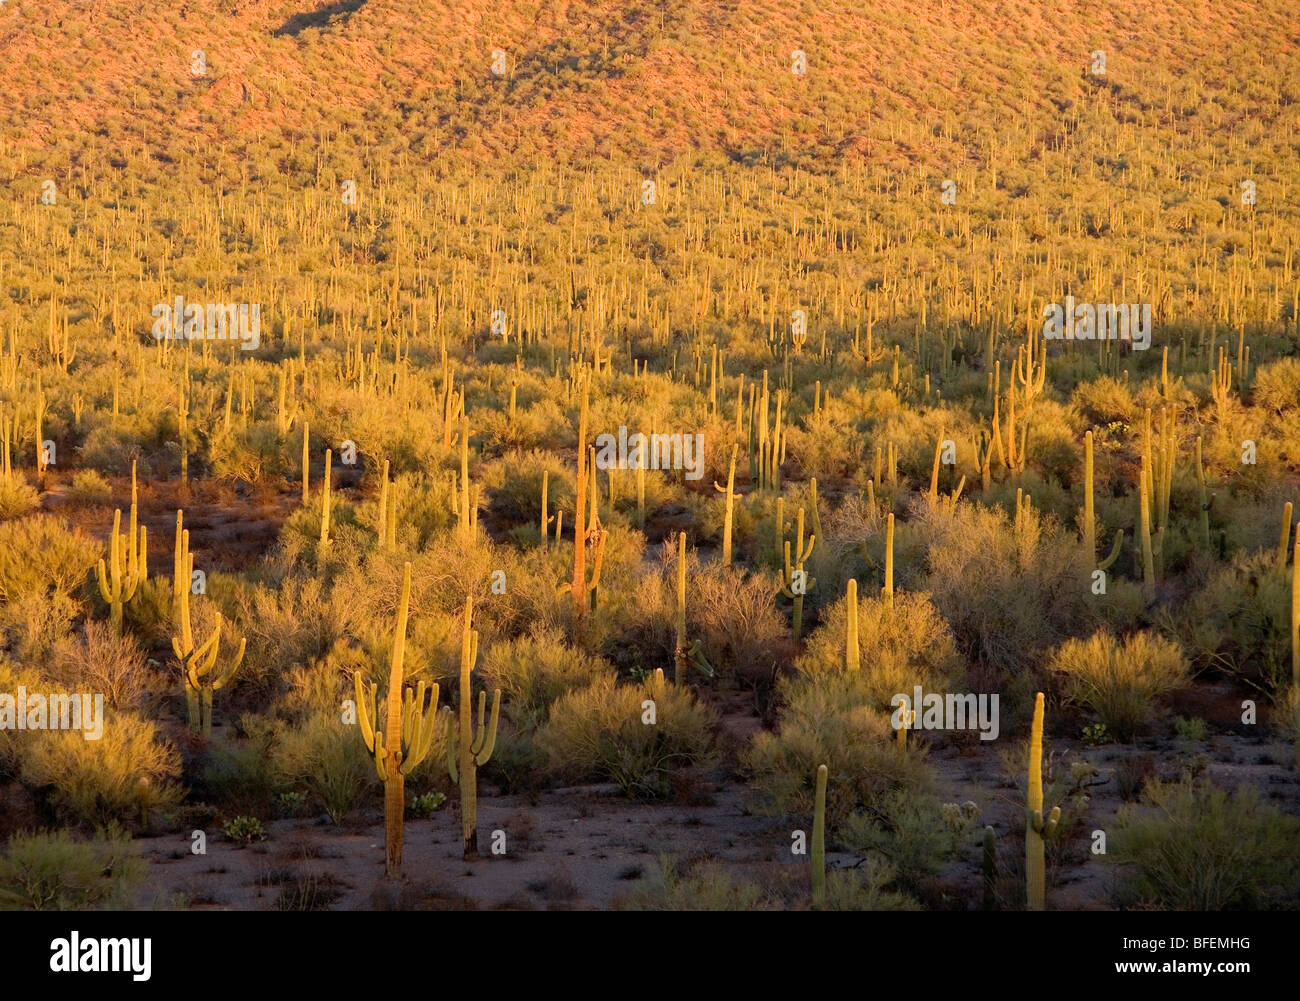 Thousands of saguaro cacti near Tucson, Arizona. - Stock Image